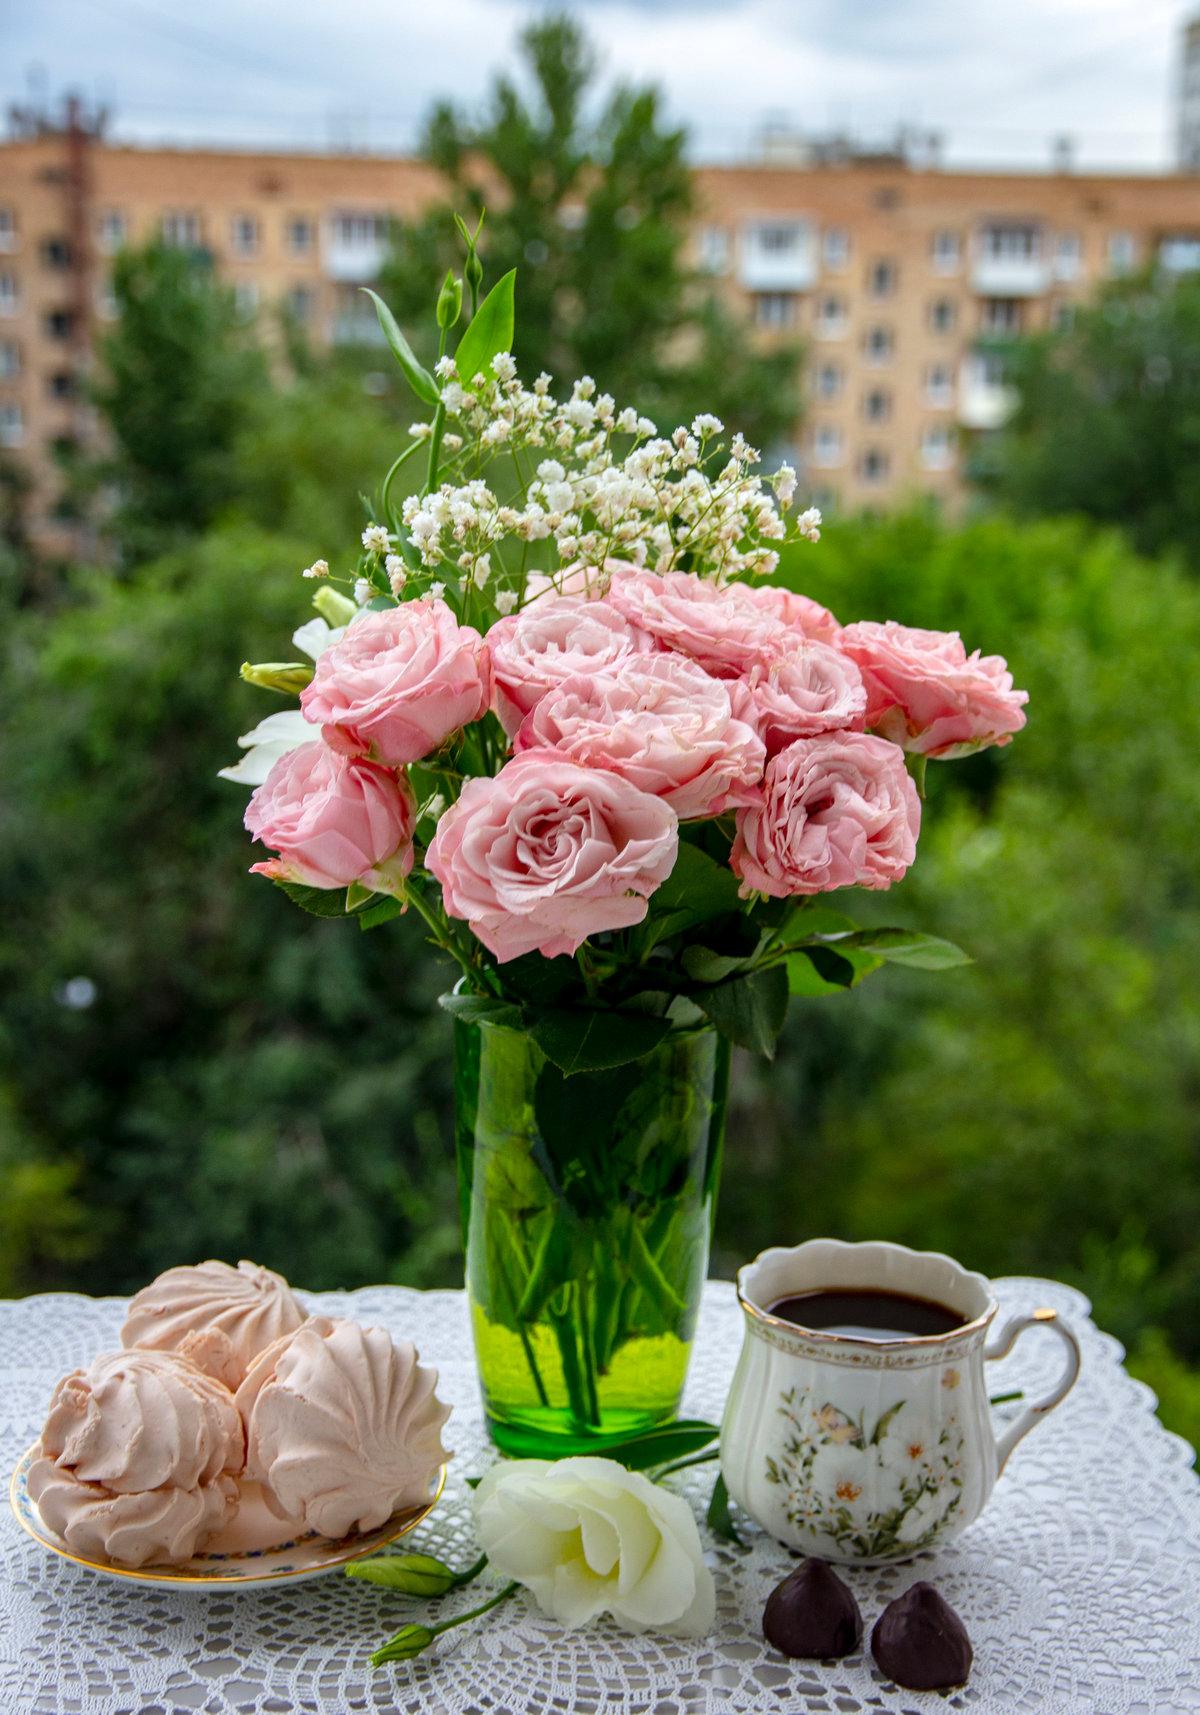 Онлайн, картинки утренние розы